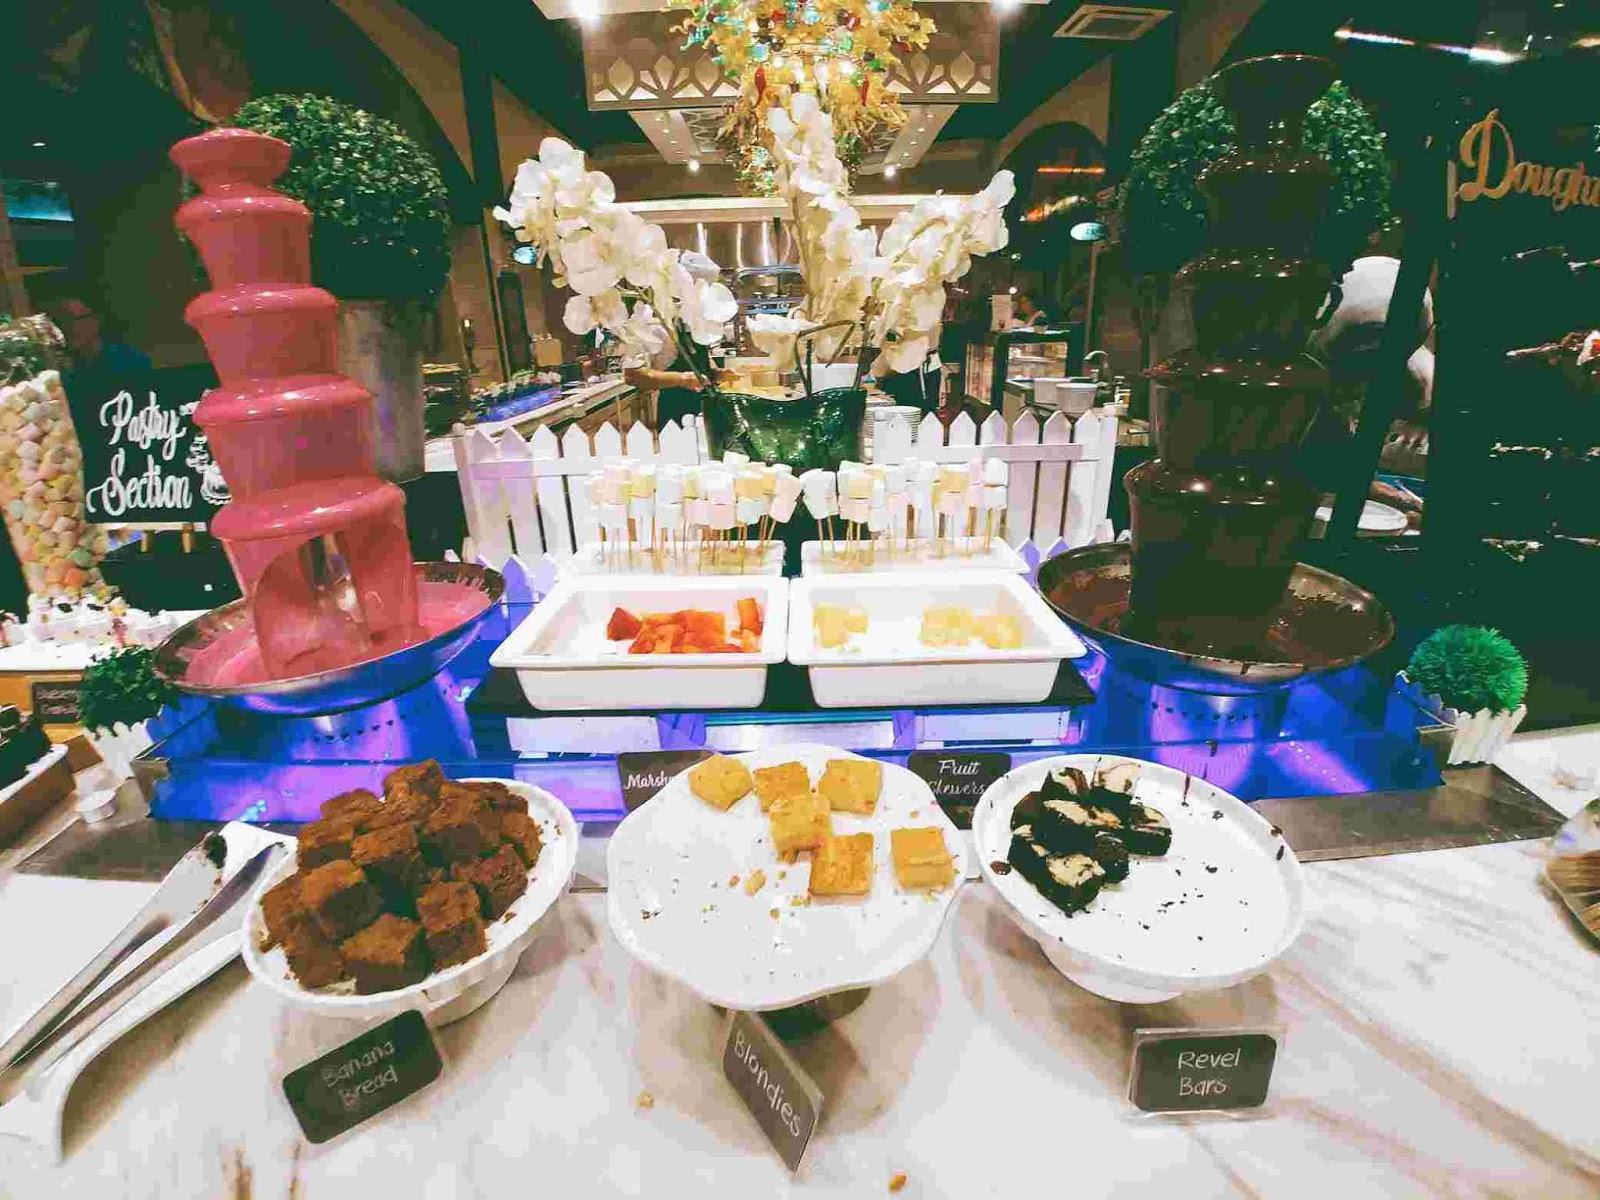 Vikings Luxury Buffet: dessert station